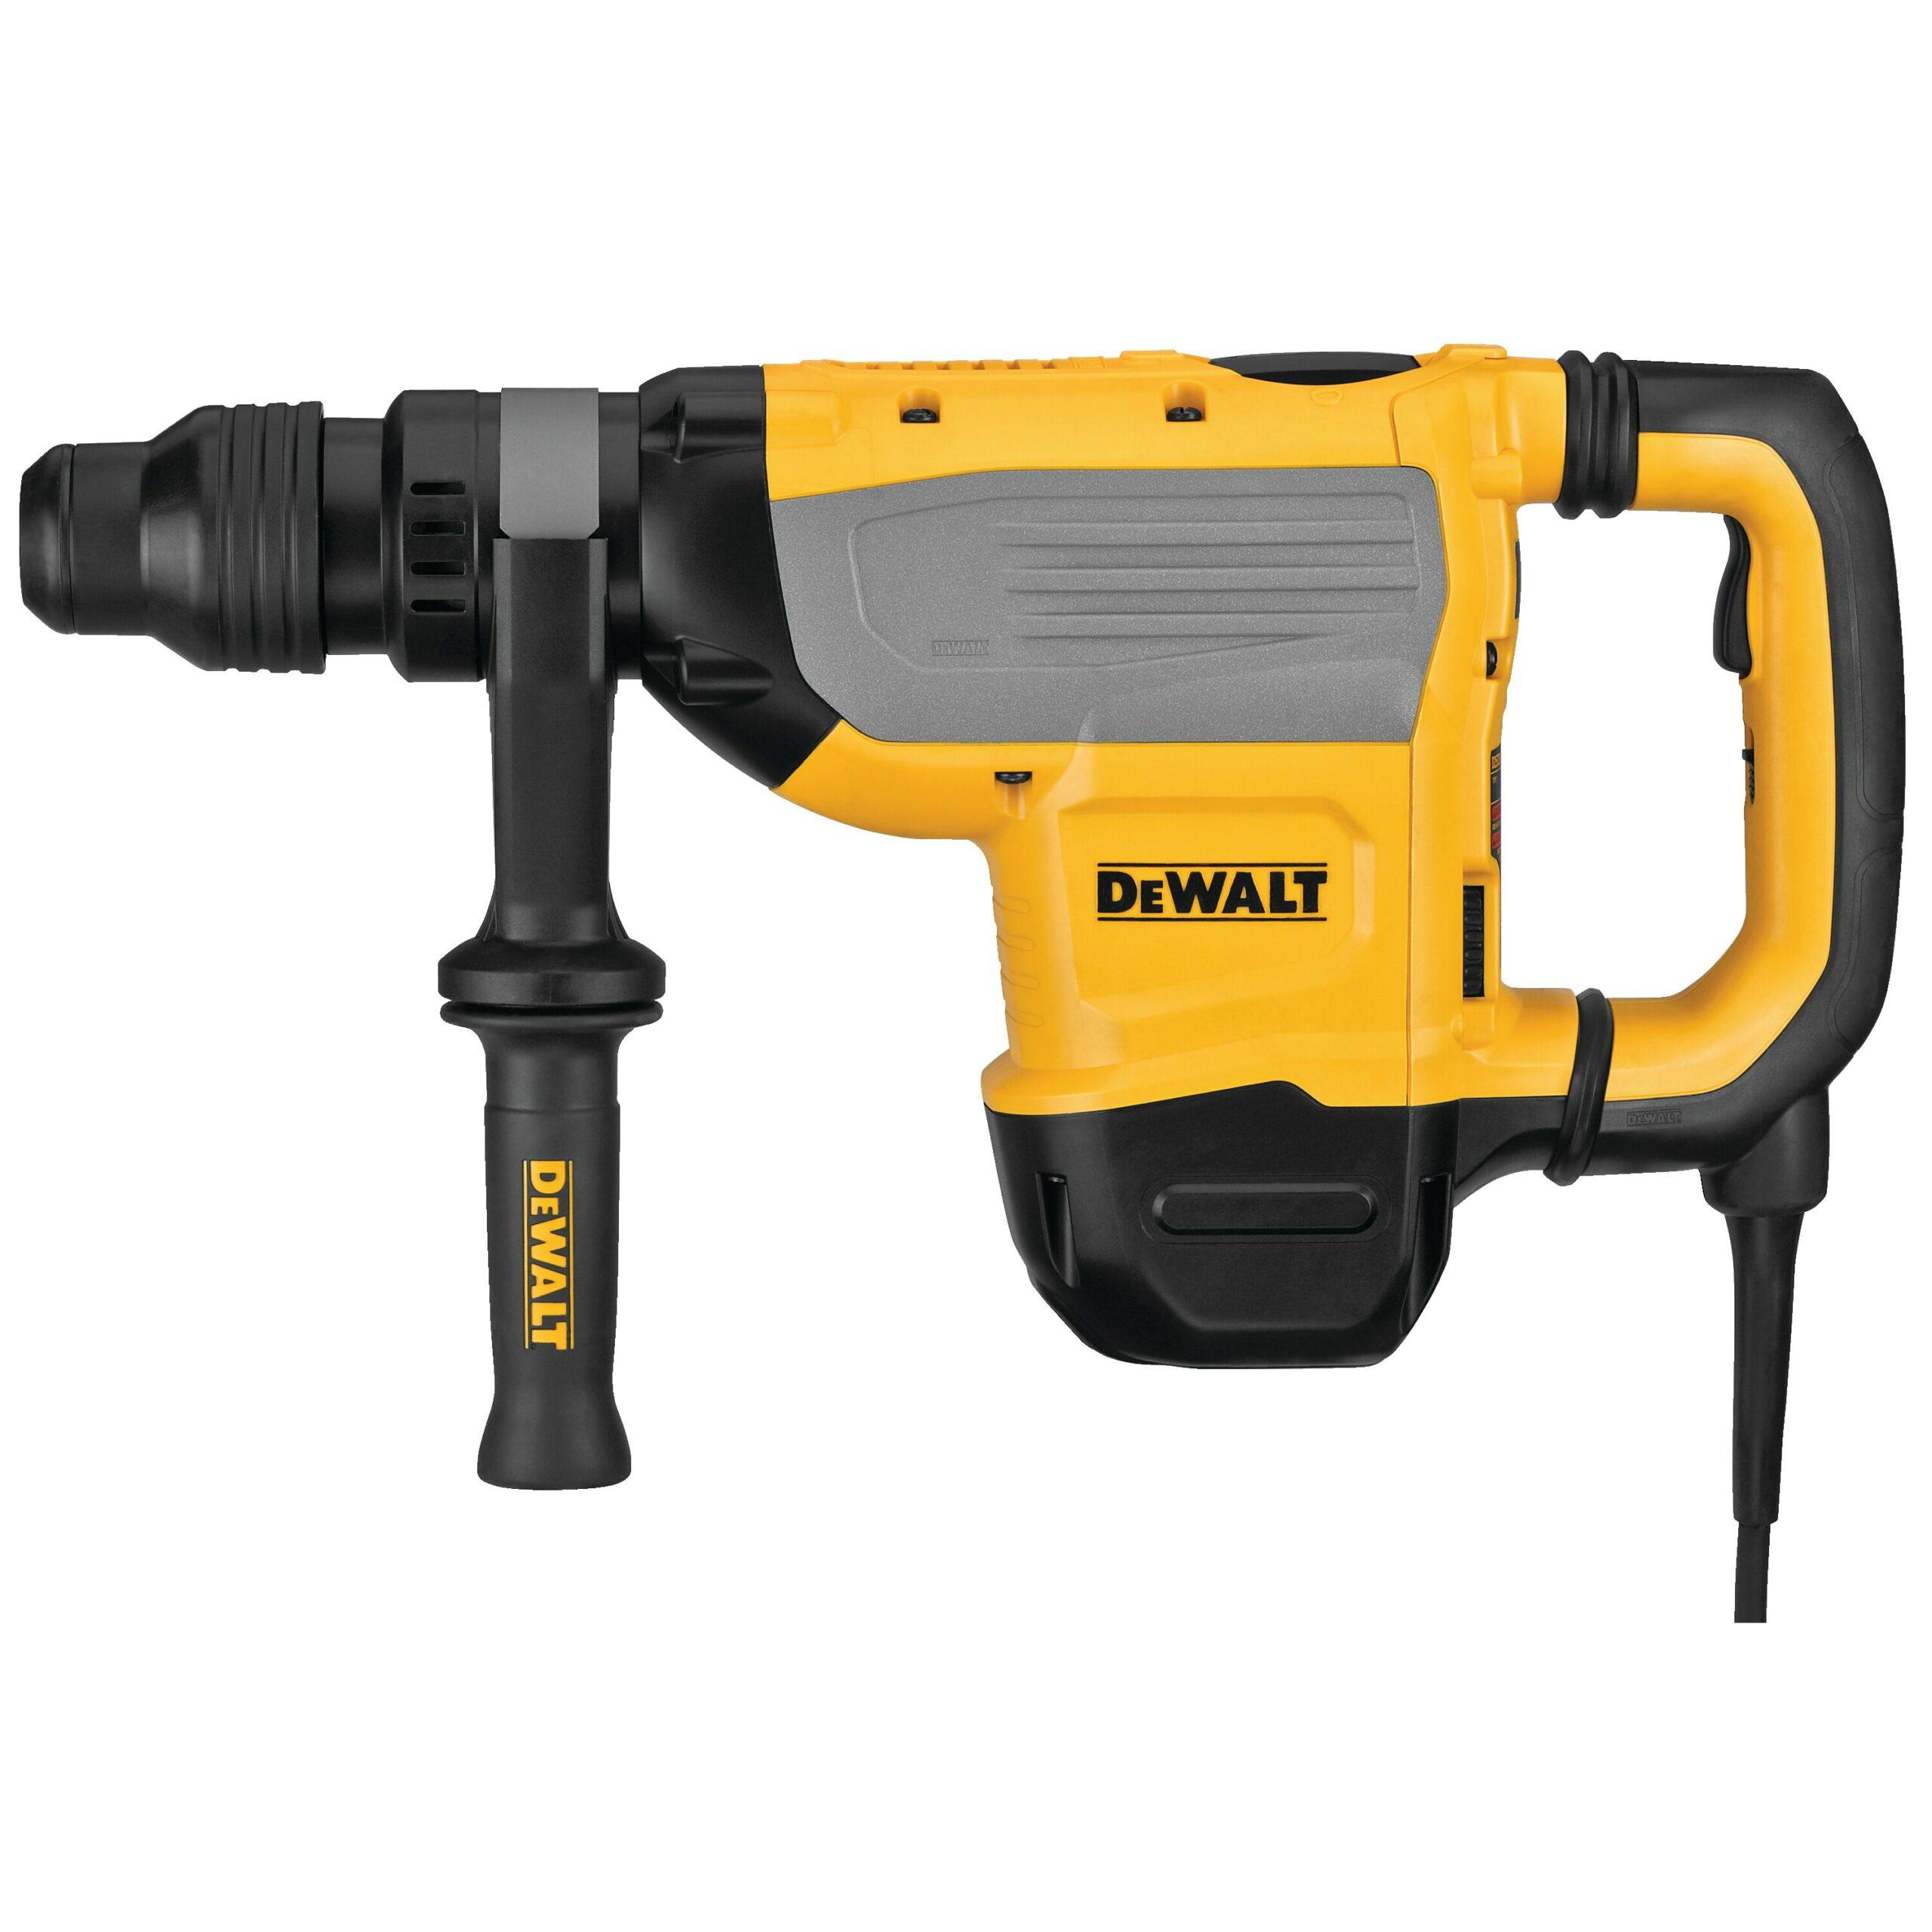 Dewalt-Rotary-Drill